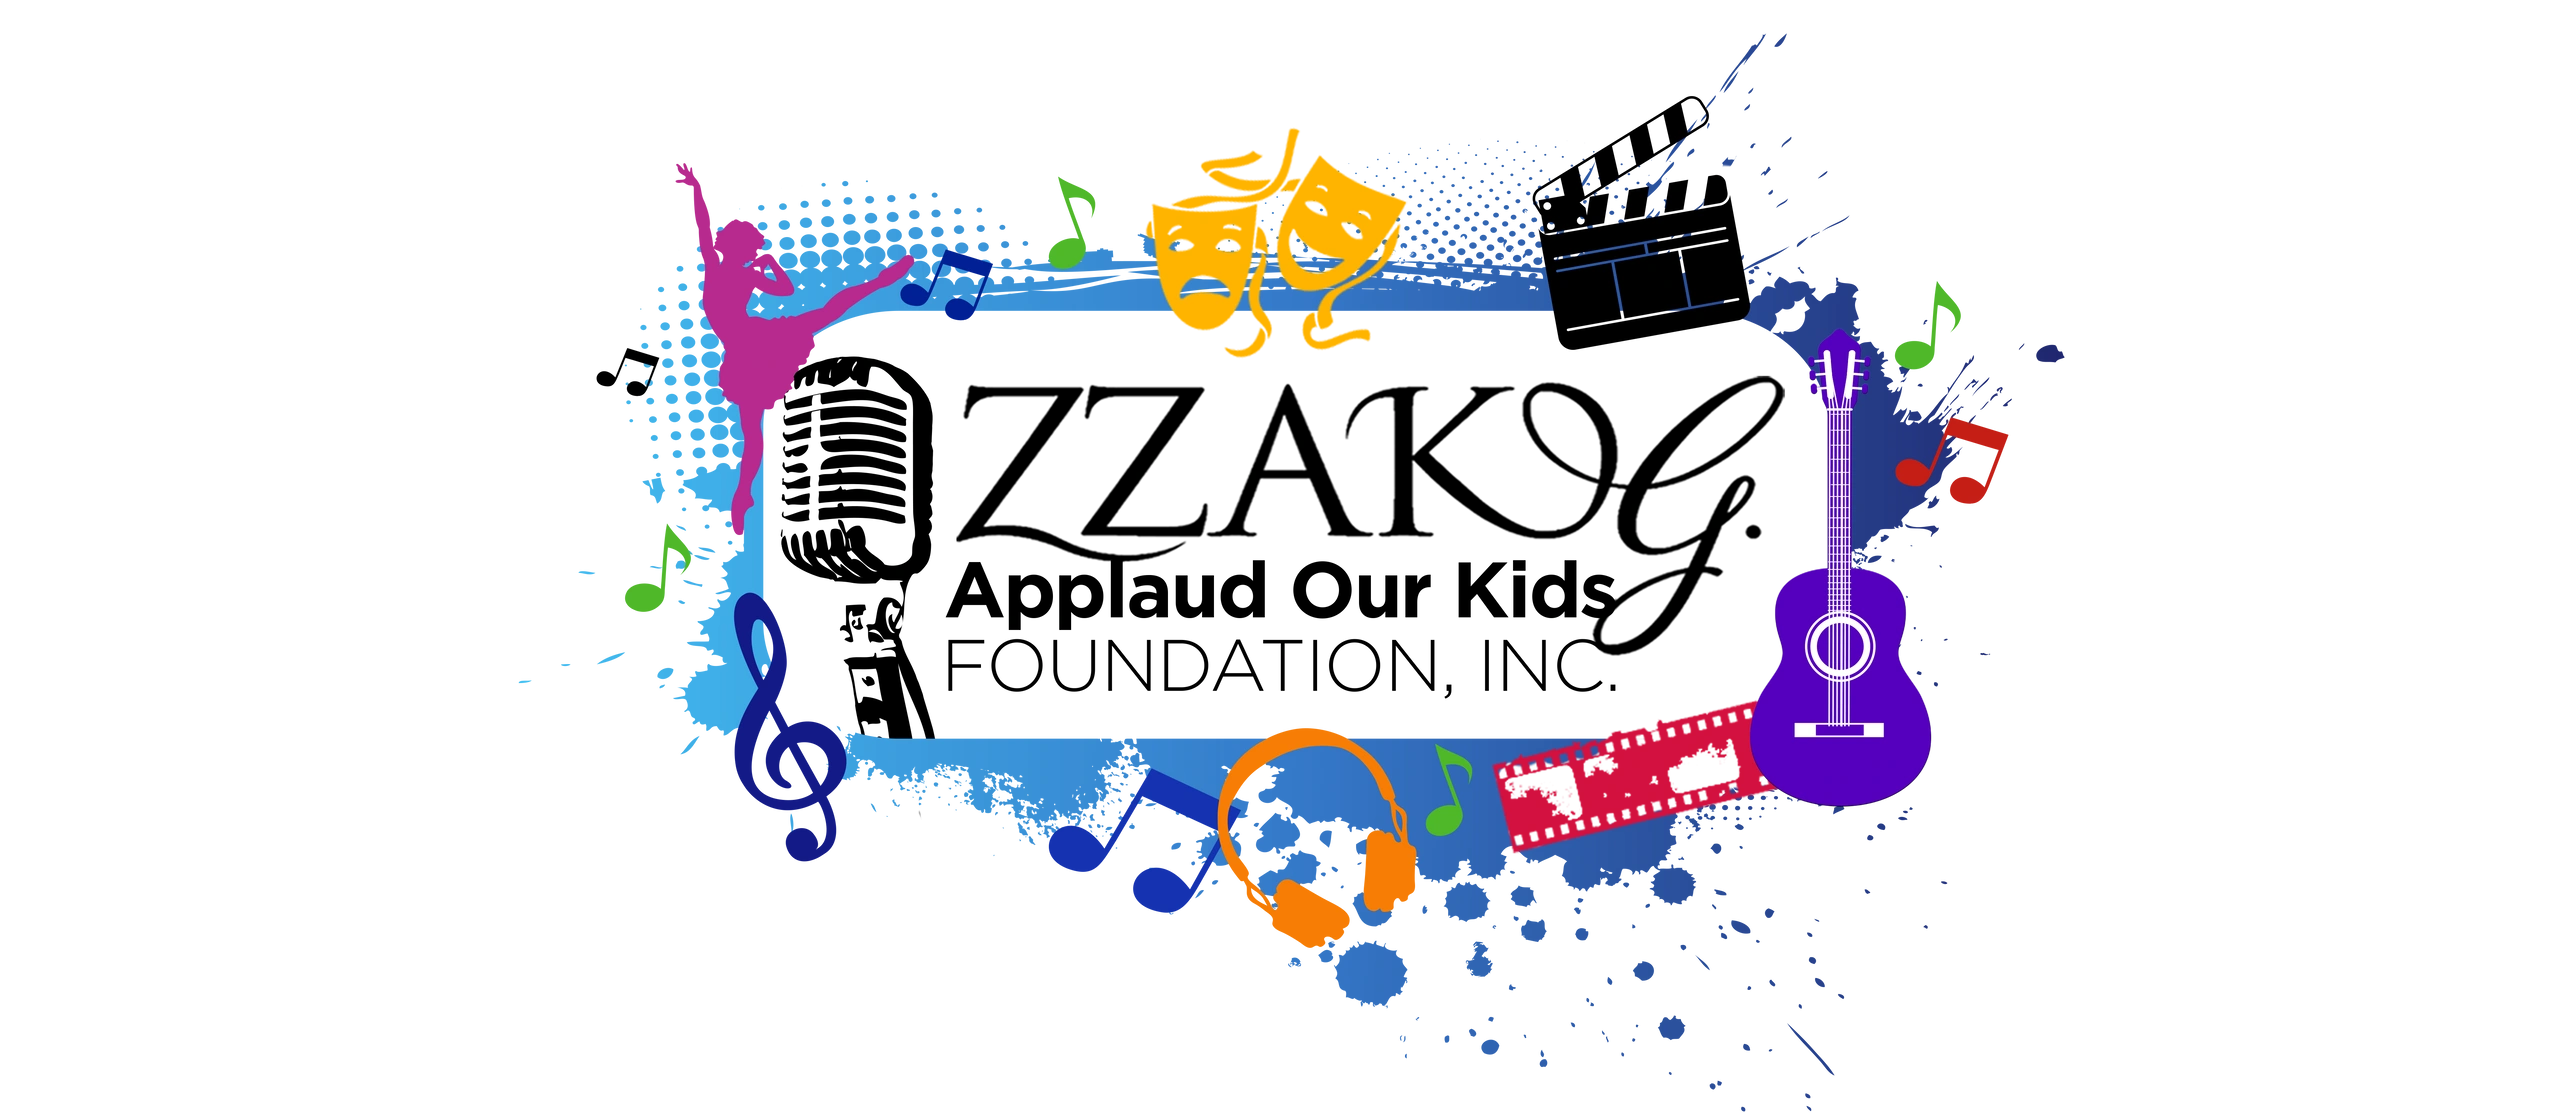 Events | Zzak G. Applaud Our Kids Foundation Inc